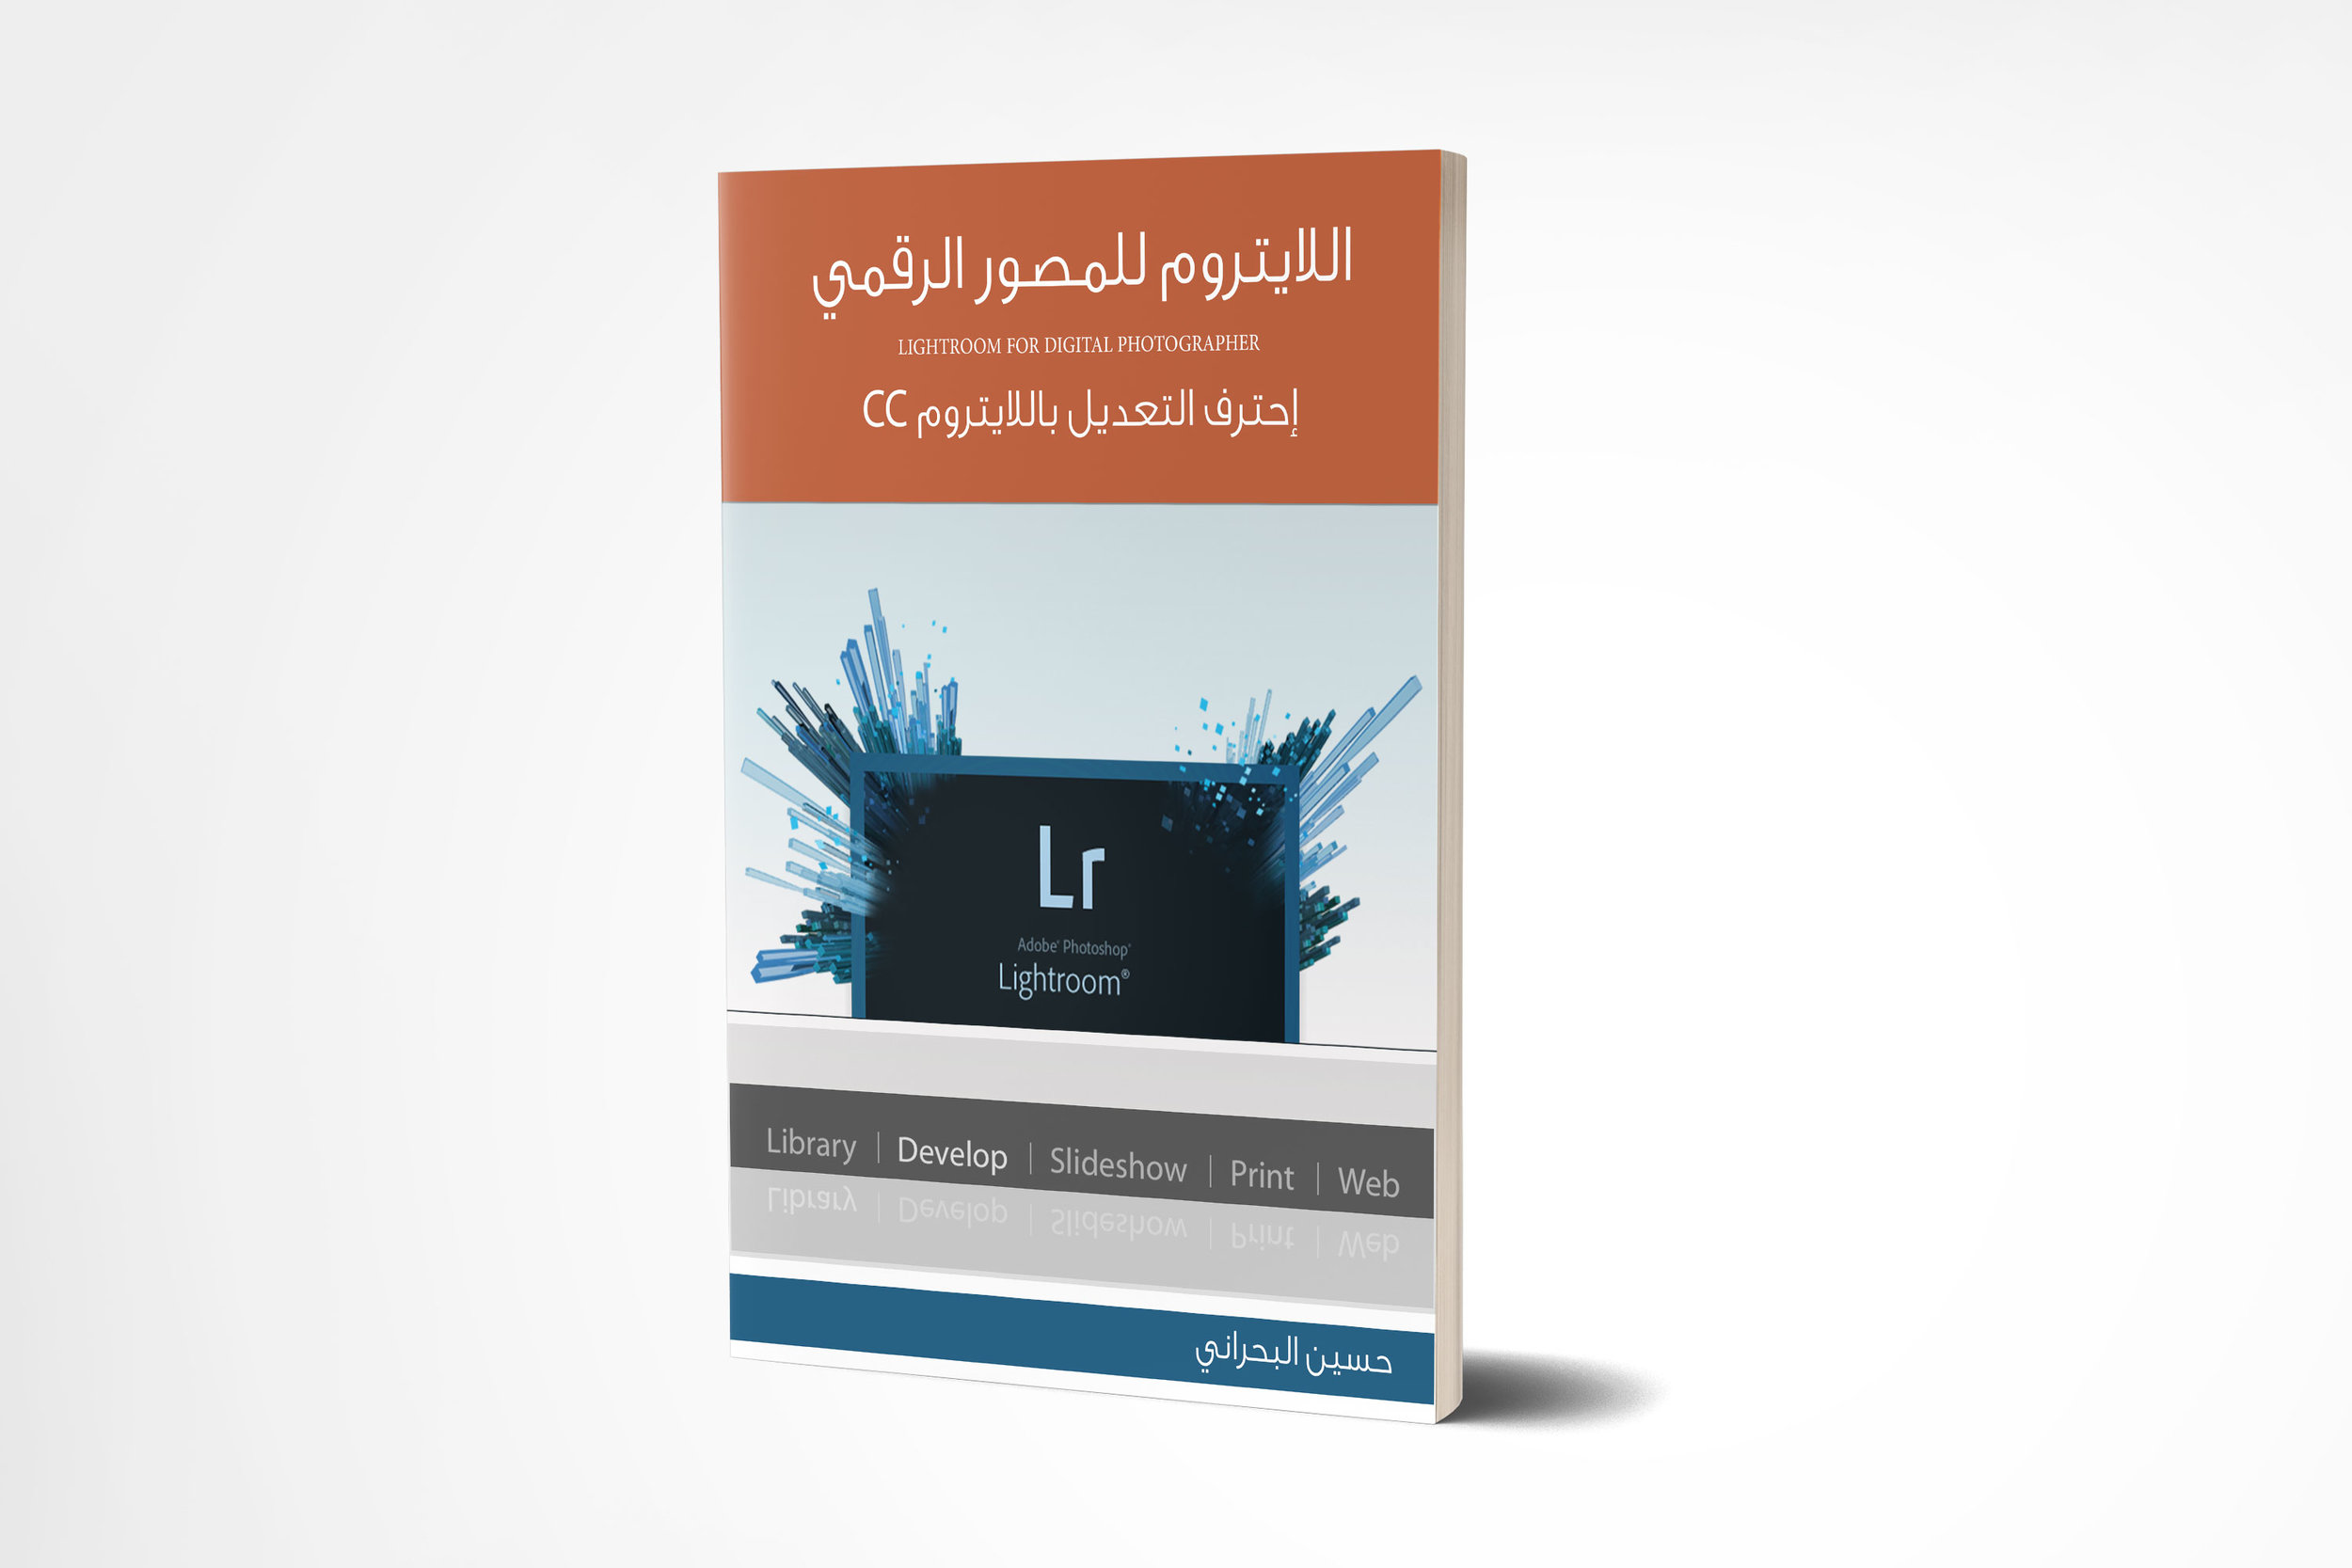 063-Paperback-Book-Small-Spine-Mockup-COVERVAULT.jpg